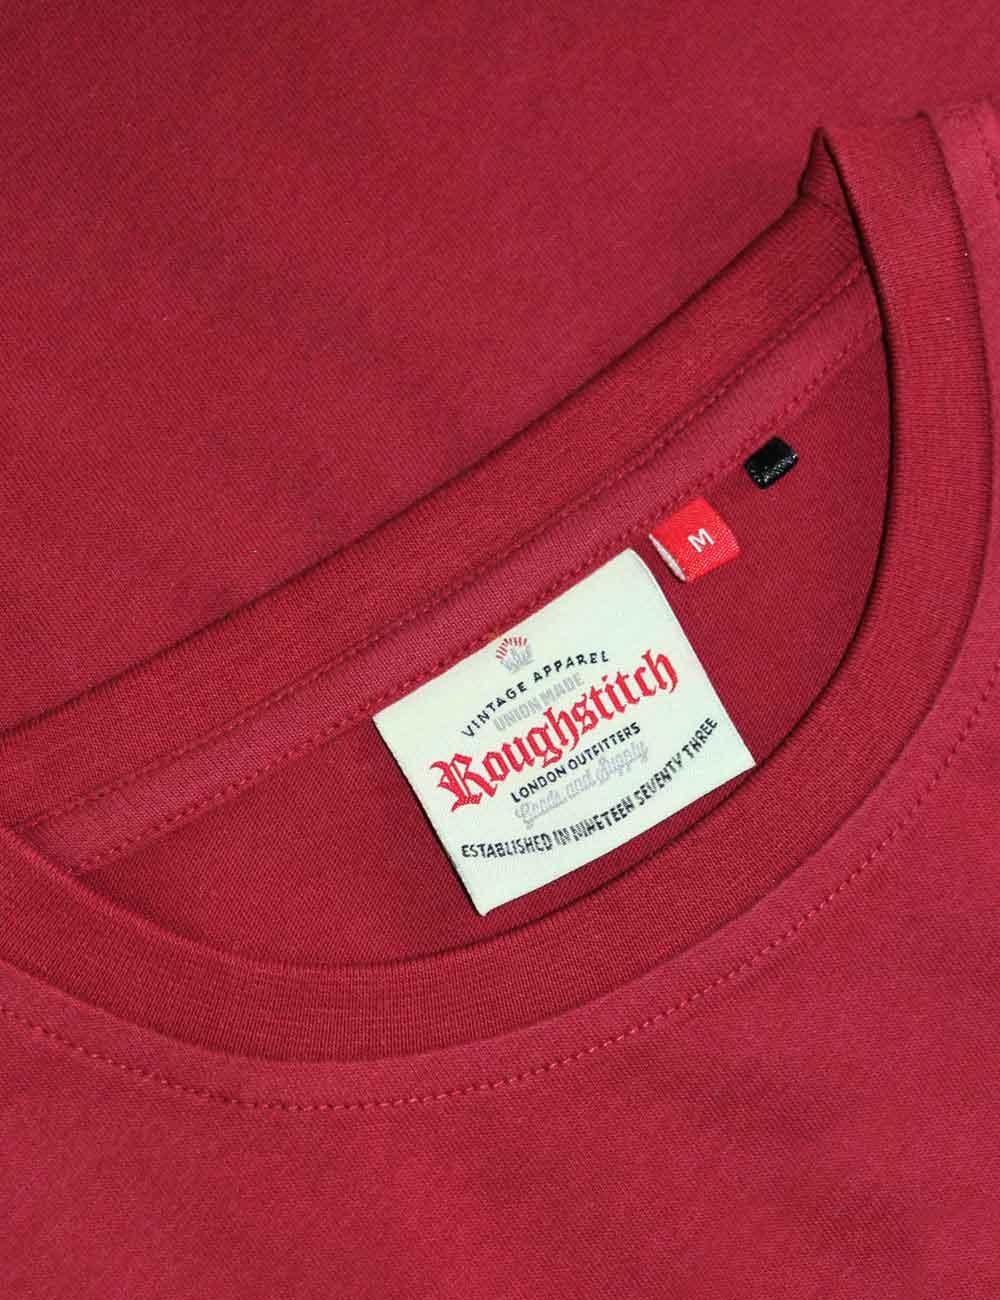 bargandy-t-shirt-neck-label1